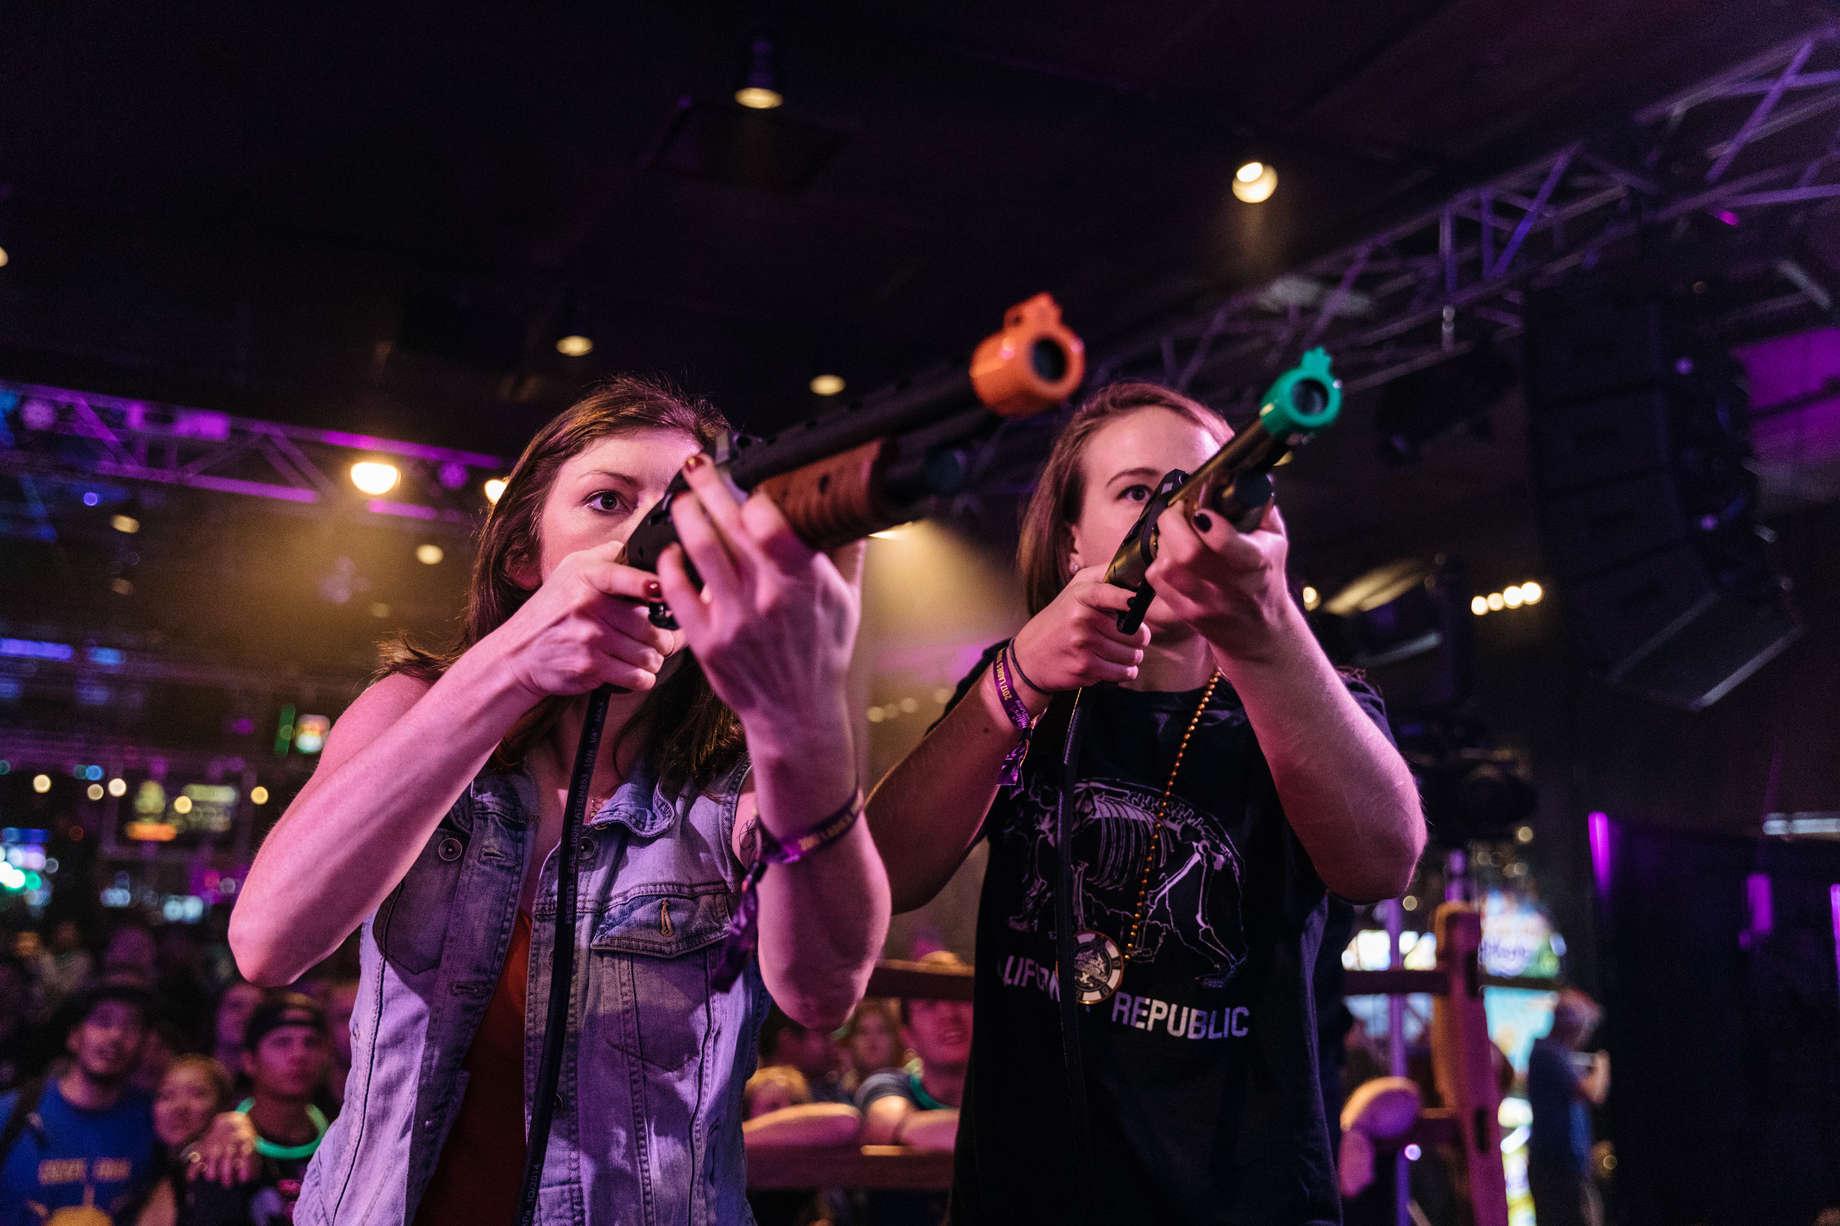 Big Buck Hunter Championship: Video Games & Gun Violence in